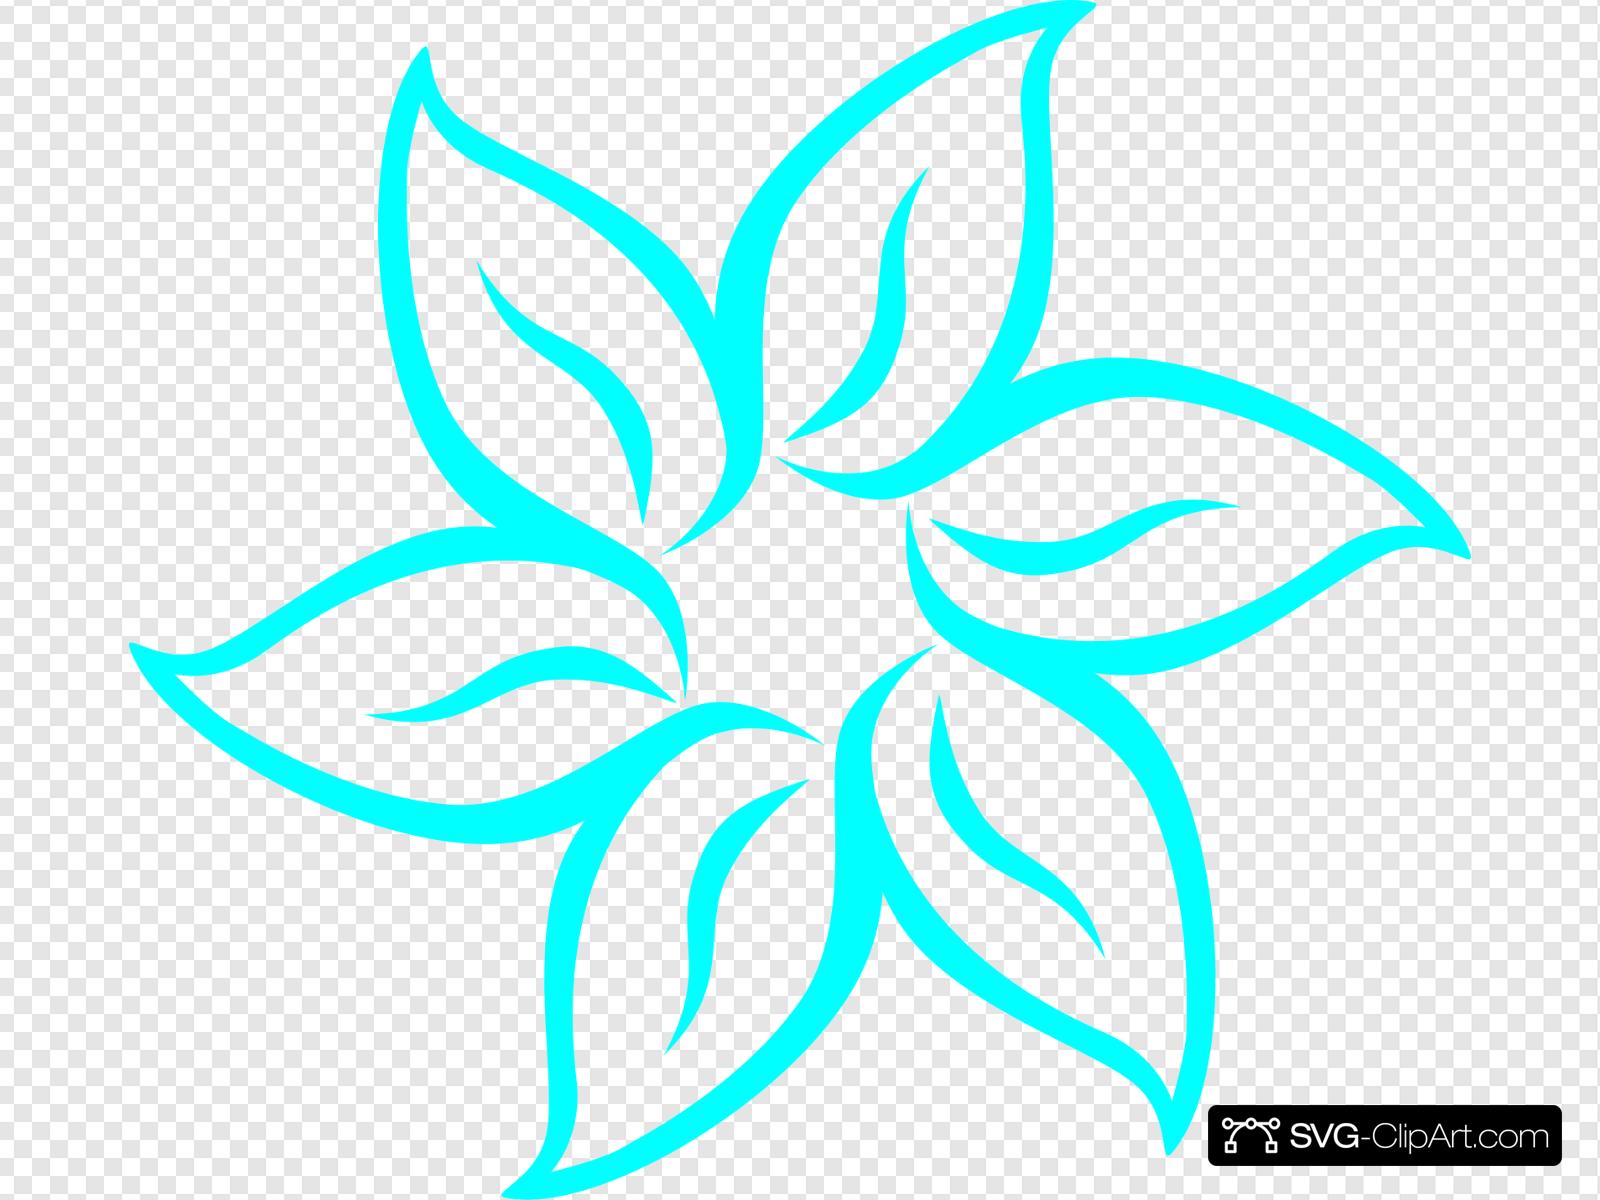 Aqua Flower Outline Clip art, Icon and SVG.